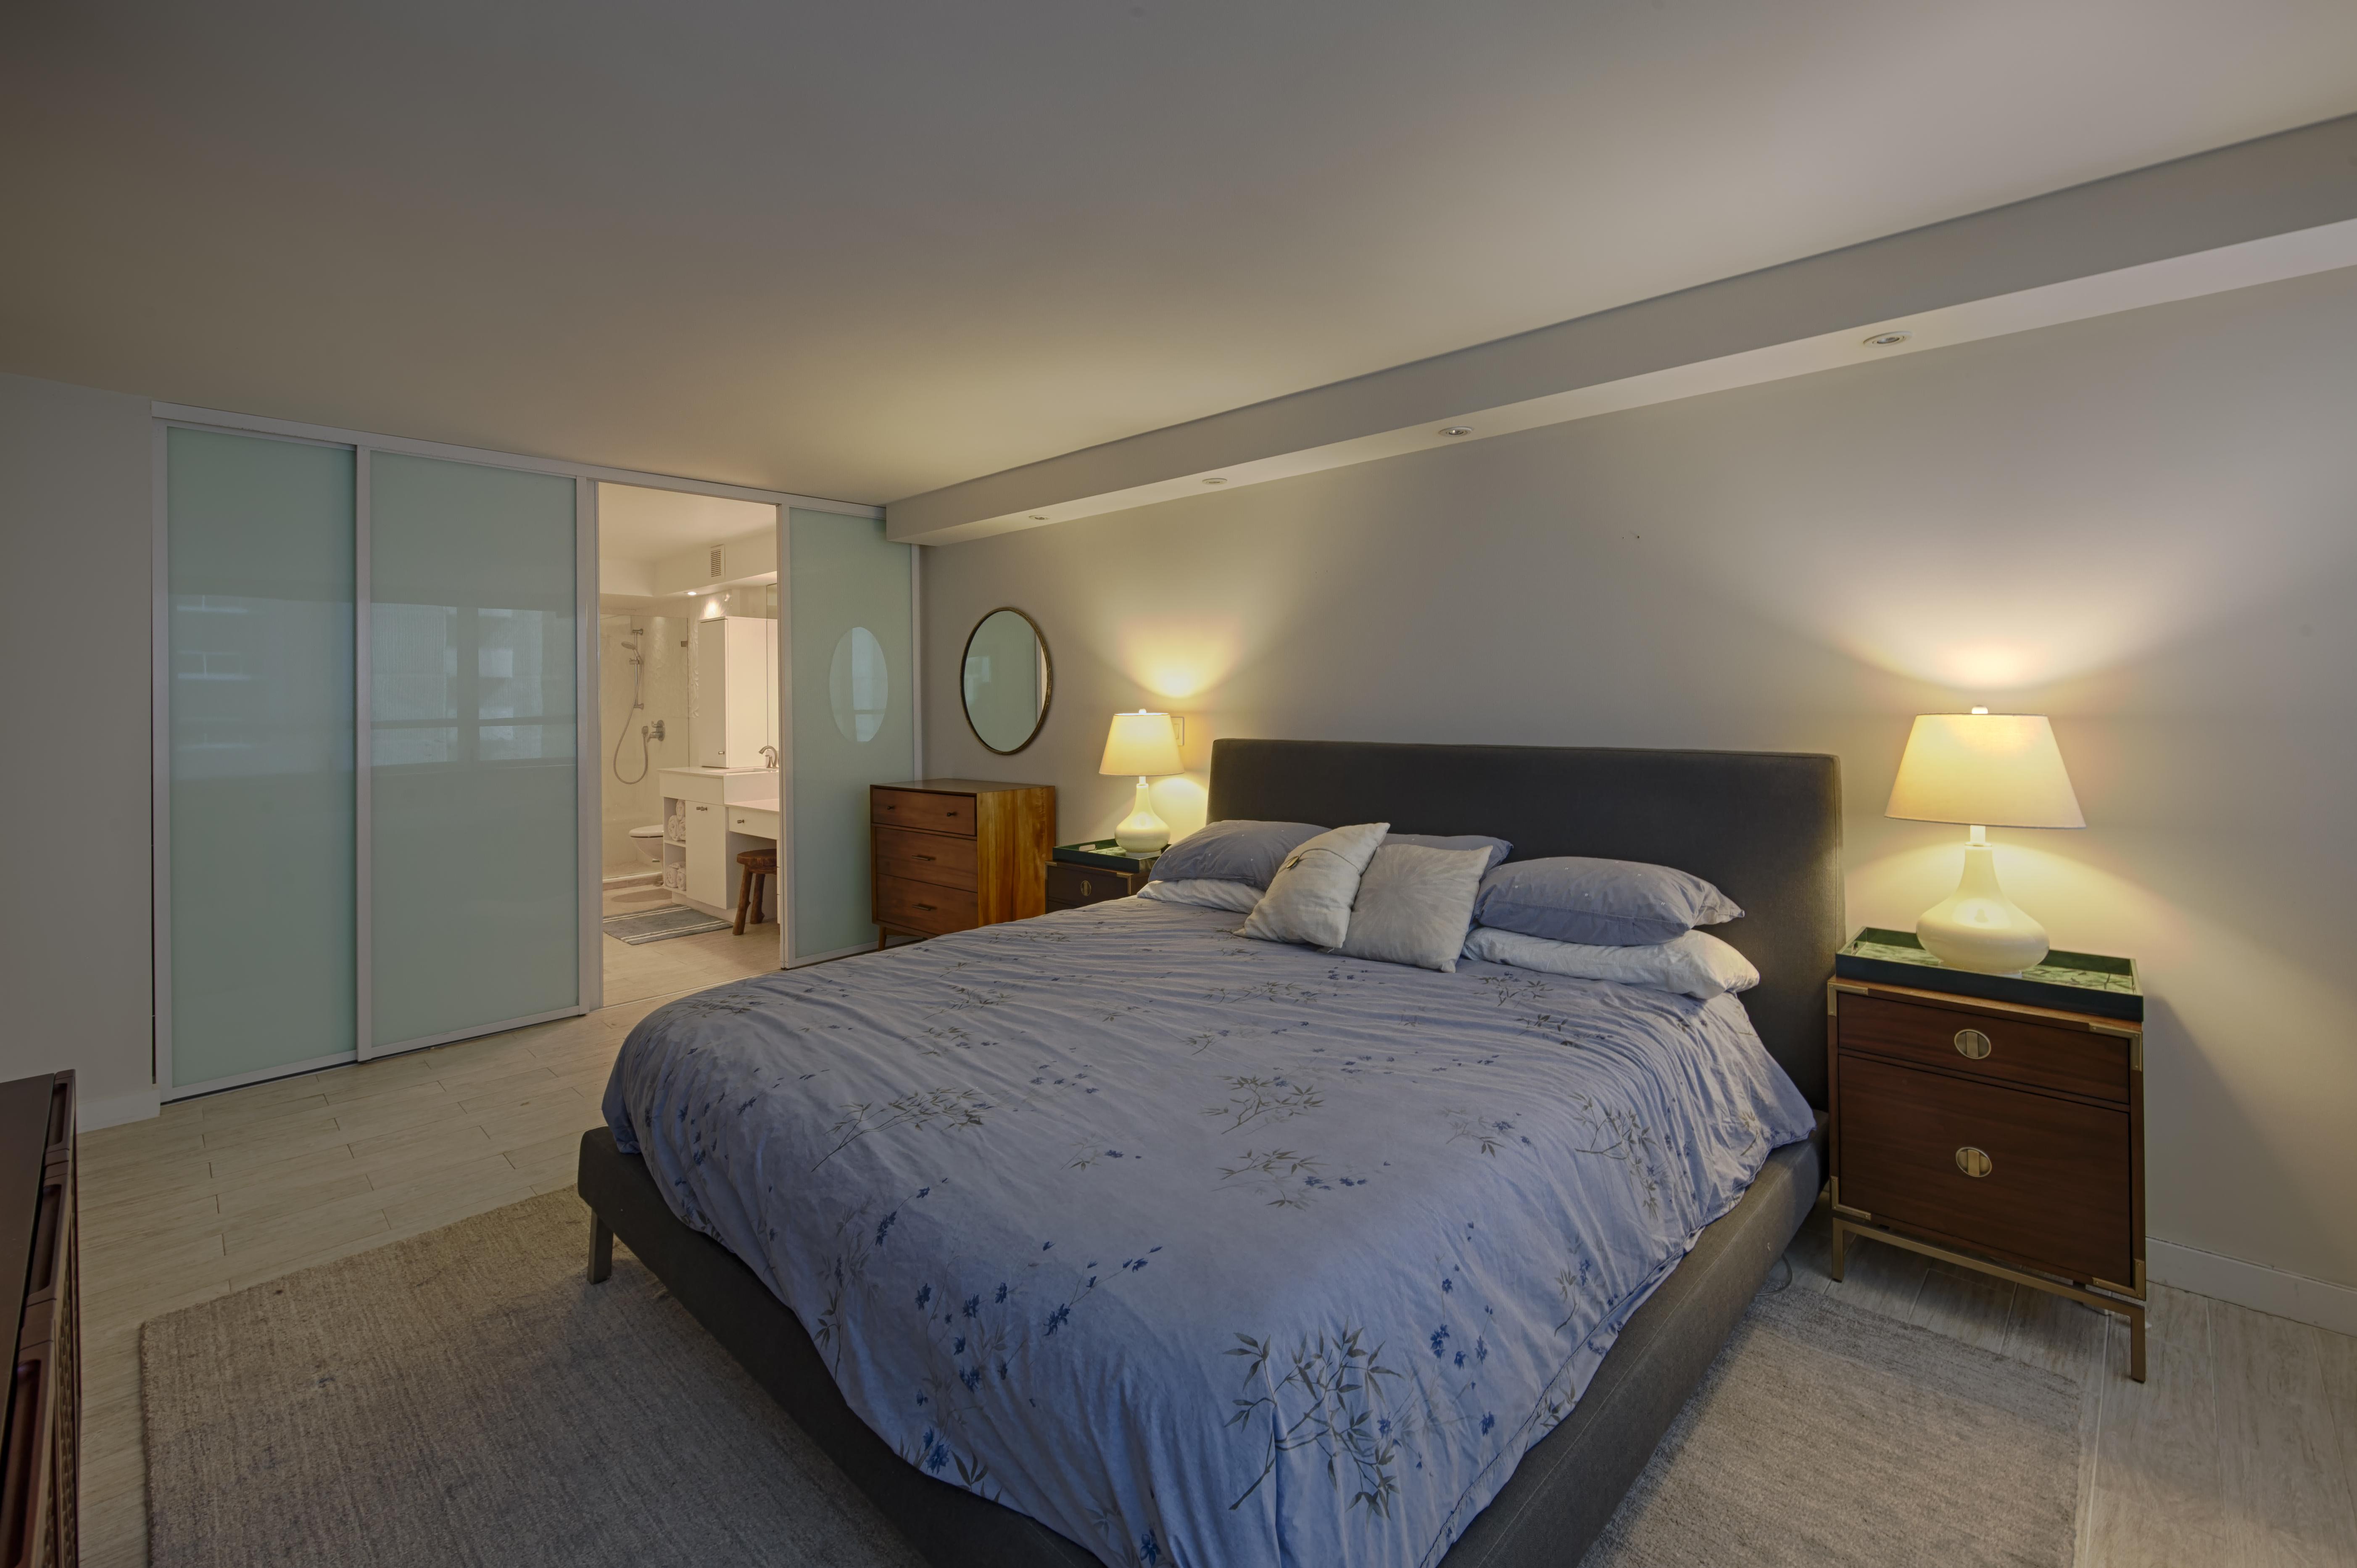 11 Island Dr #1707 bedroom miami real estate